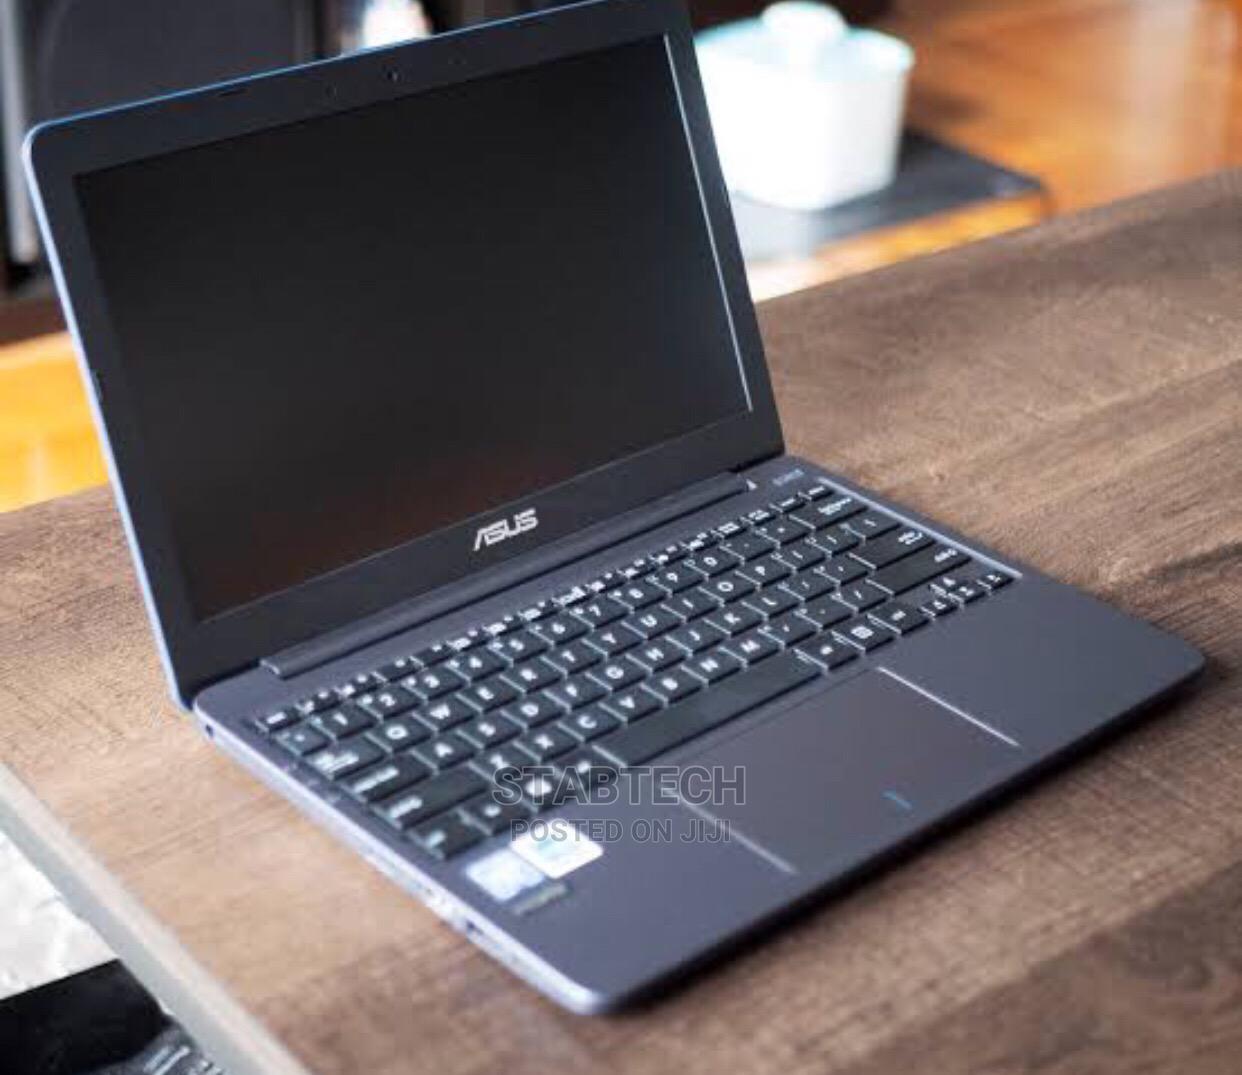 Laptop Asus A52JE 4GB Intel Core i5 HDD 320GB